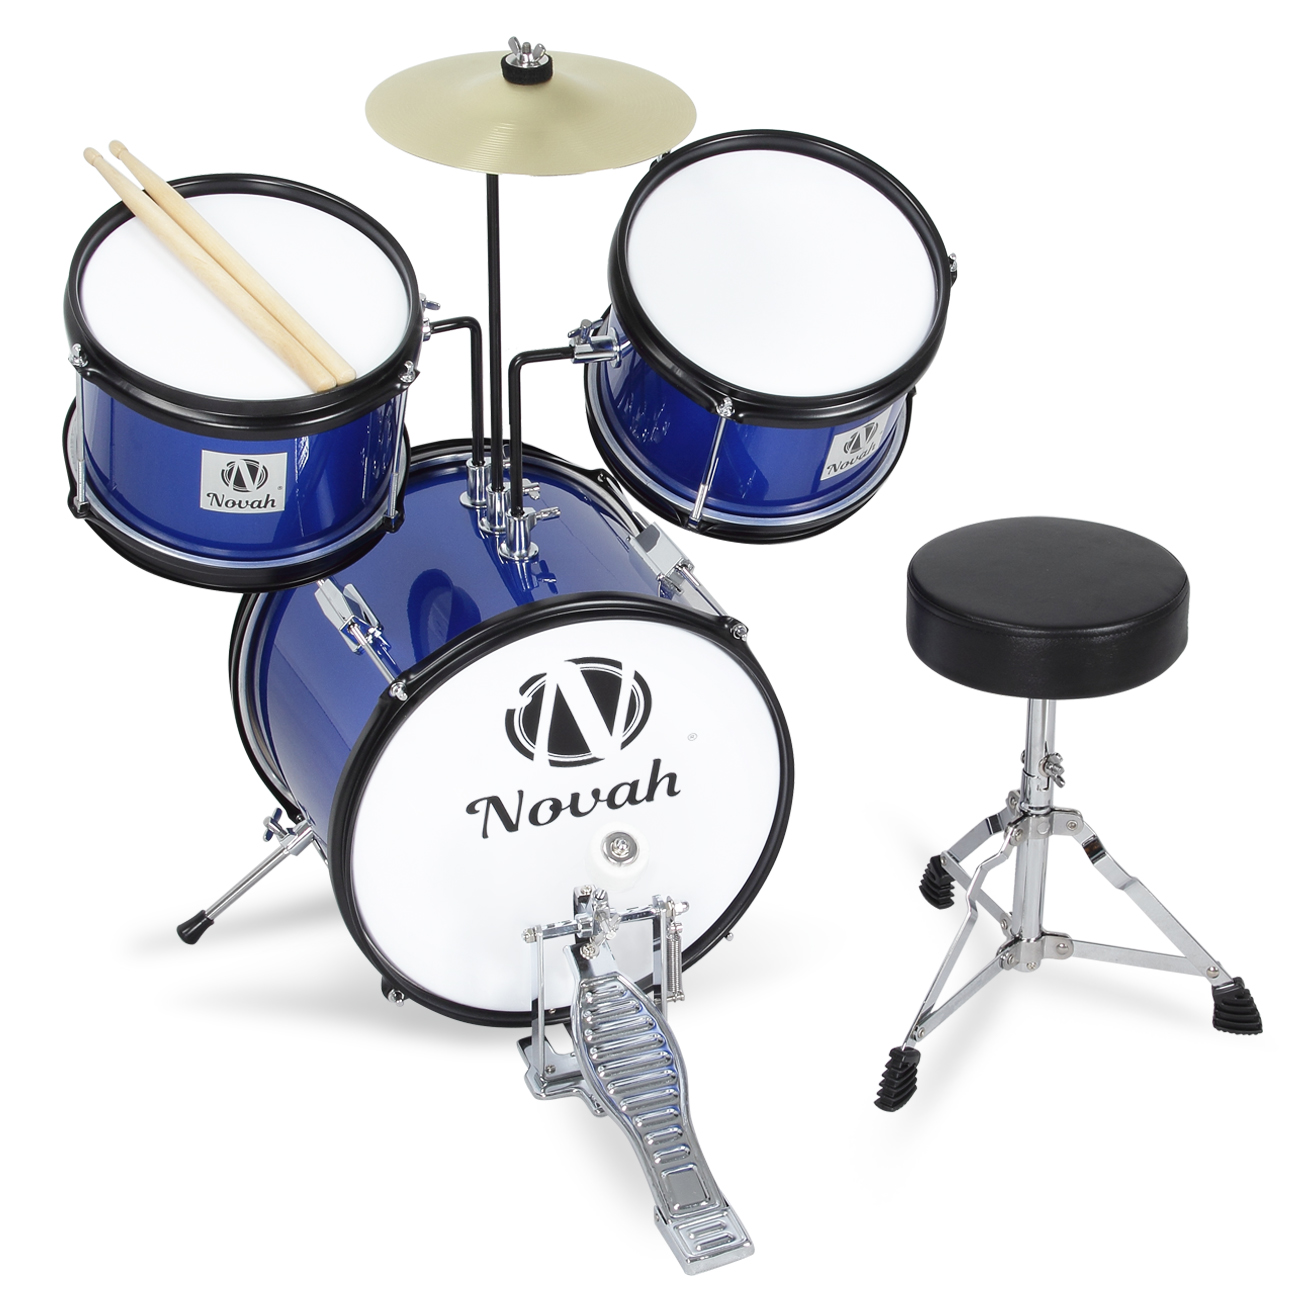 Drum Set 3 Piece Junior Complete Child Kids Kit With Stool